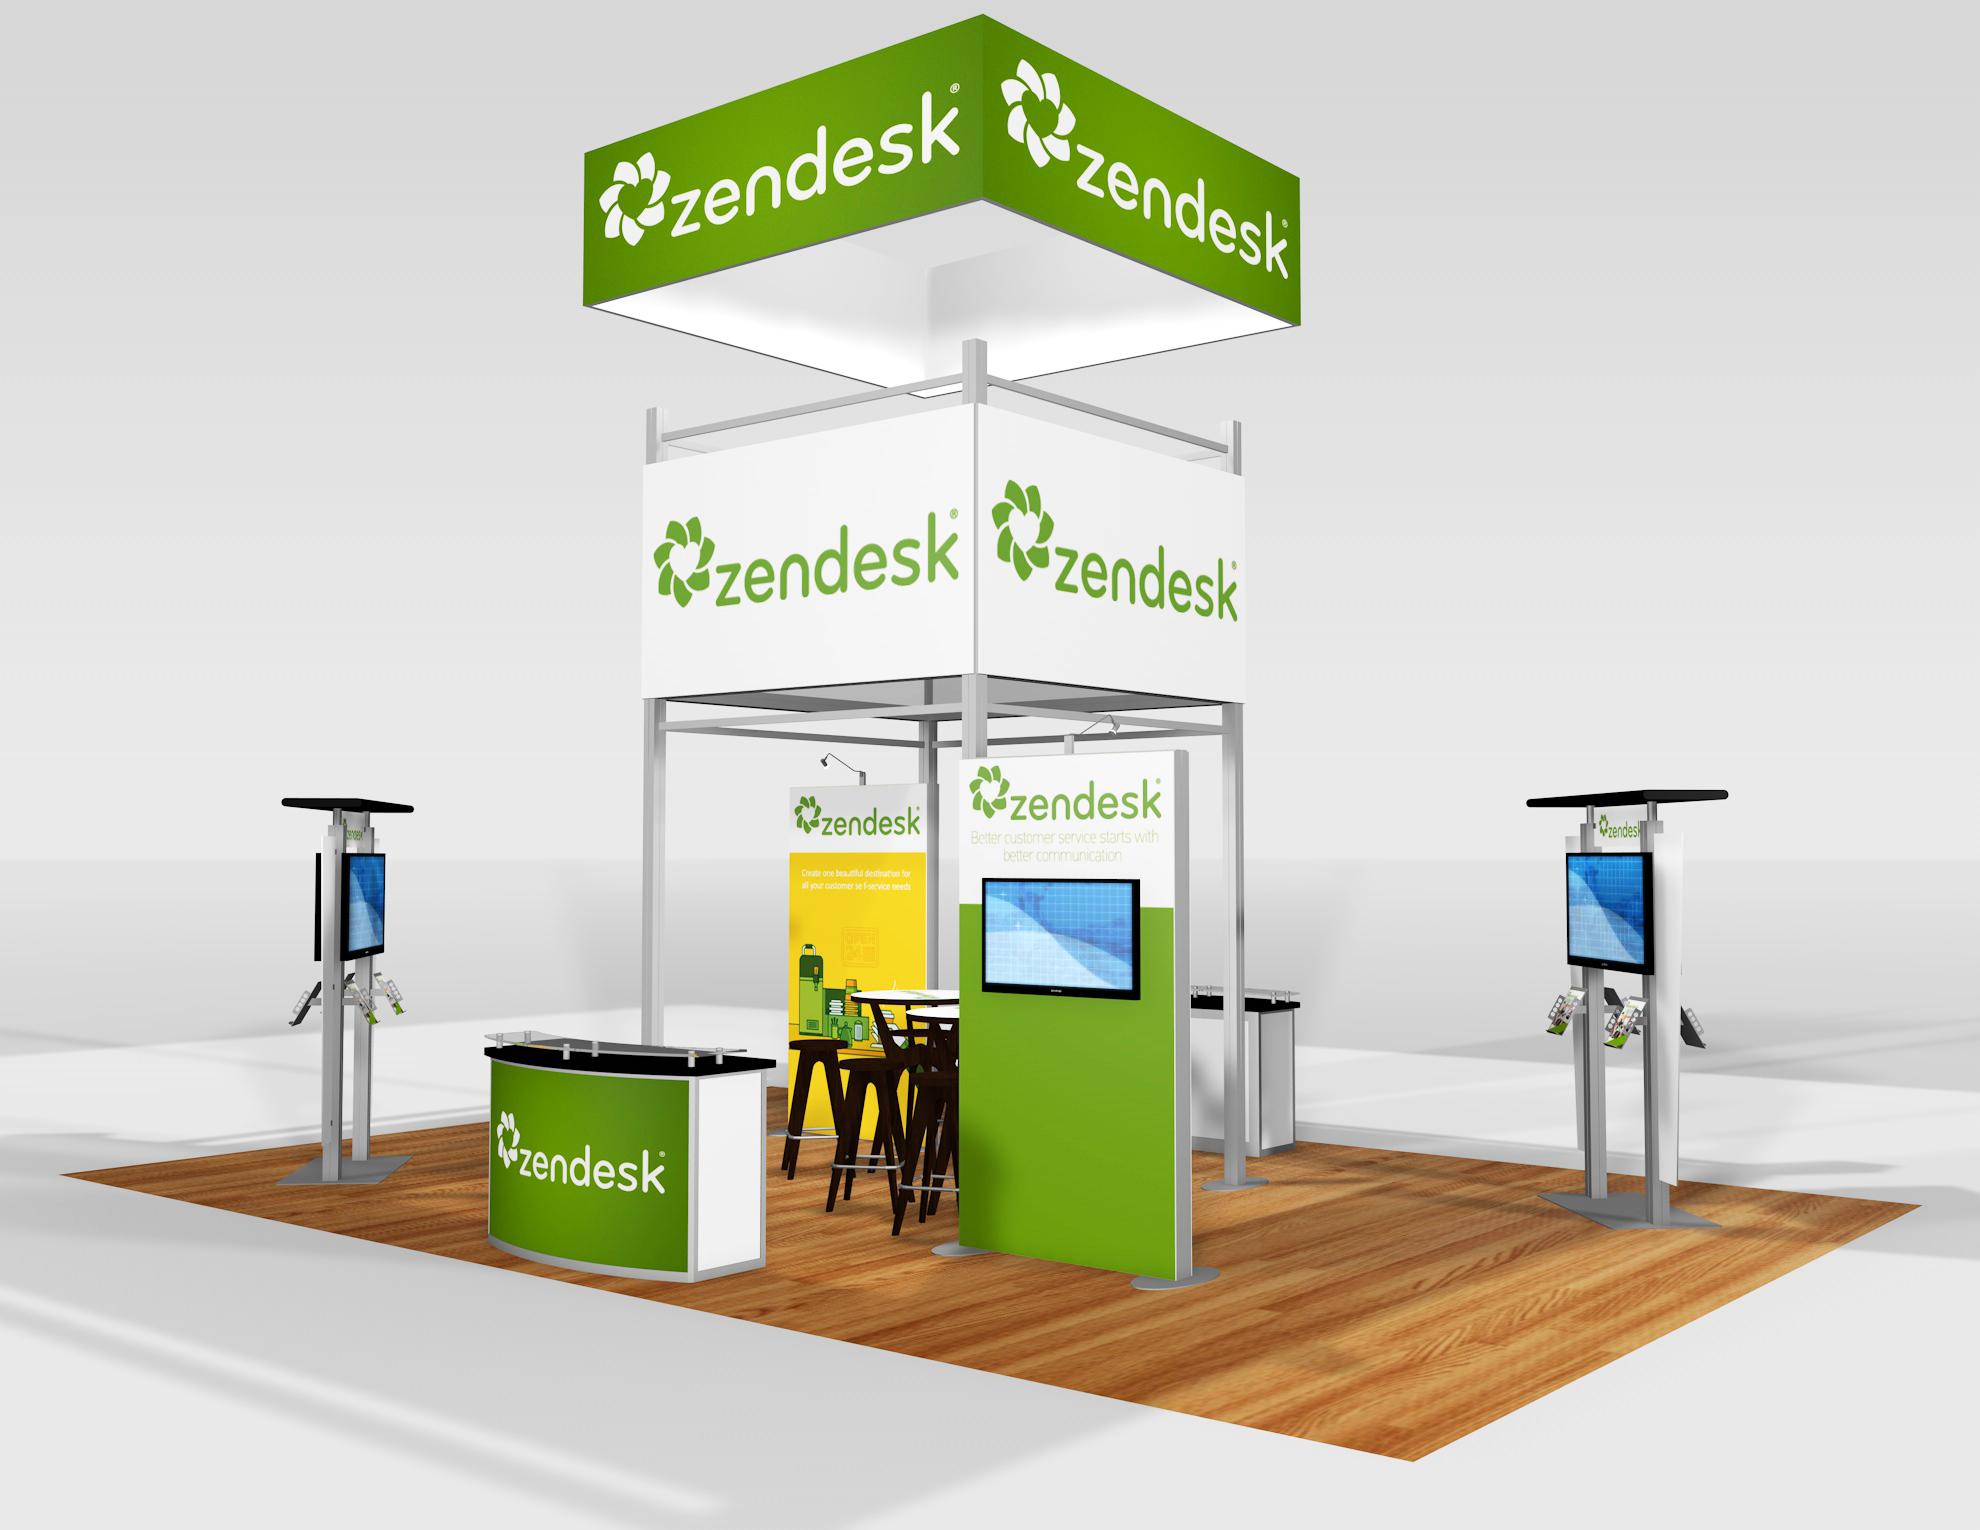 Exhibition Booth Rental Penang : Exhibit design search re zendesk island rental